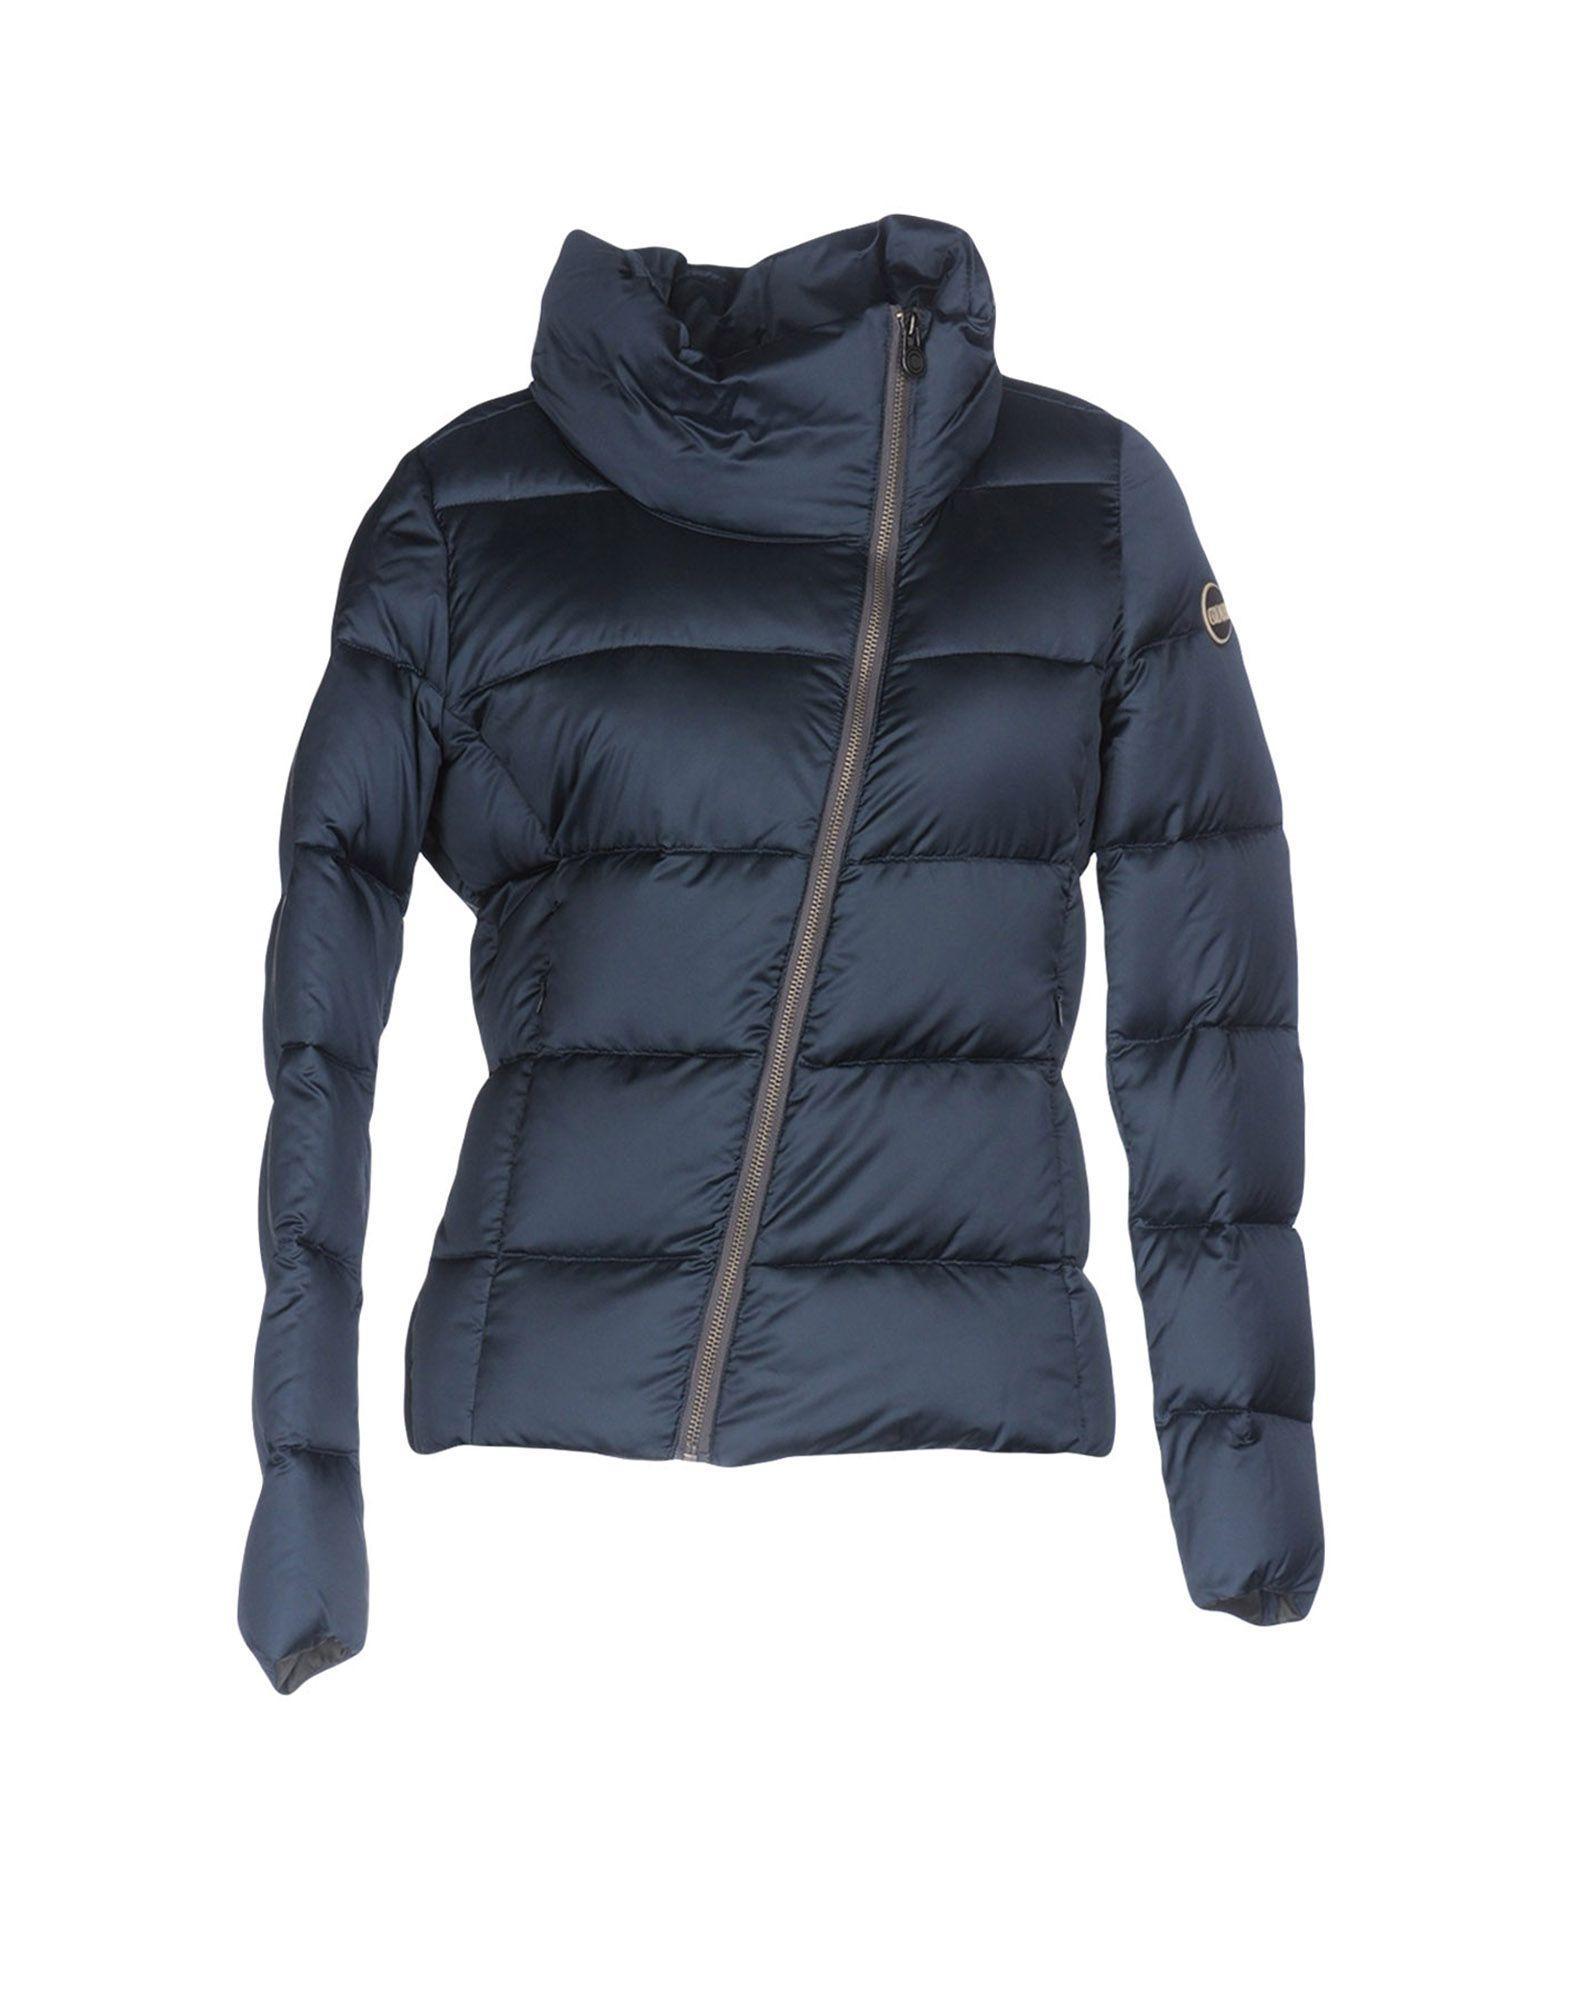 Colmar Originals Down Jacket In Slate Blue